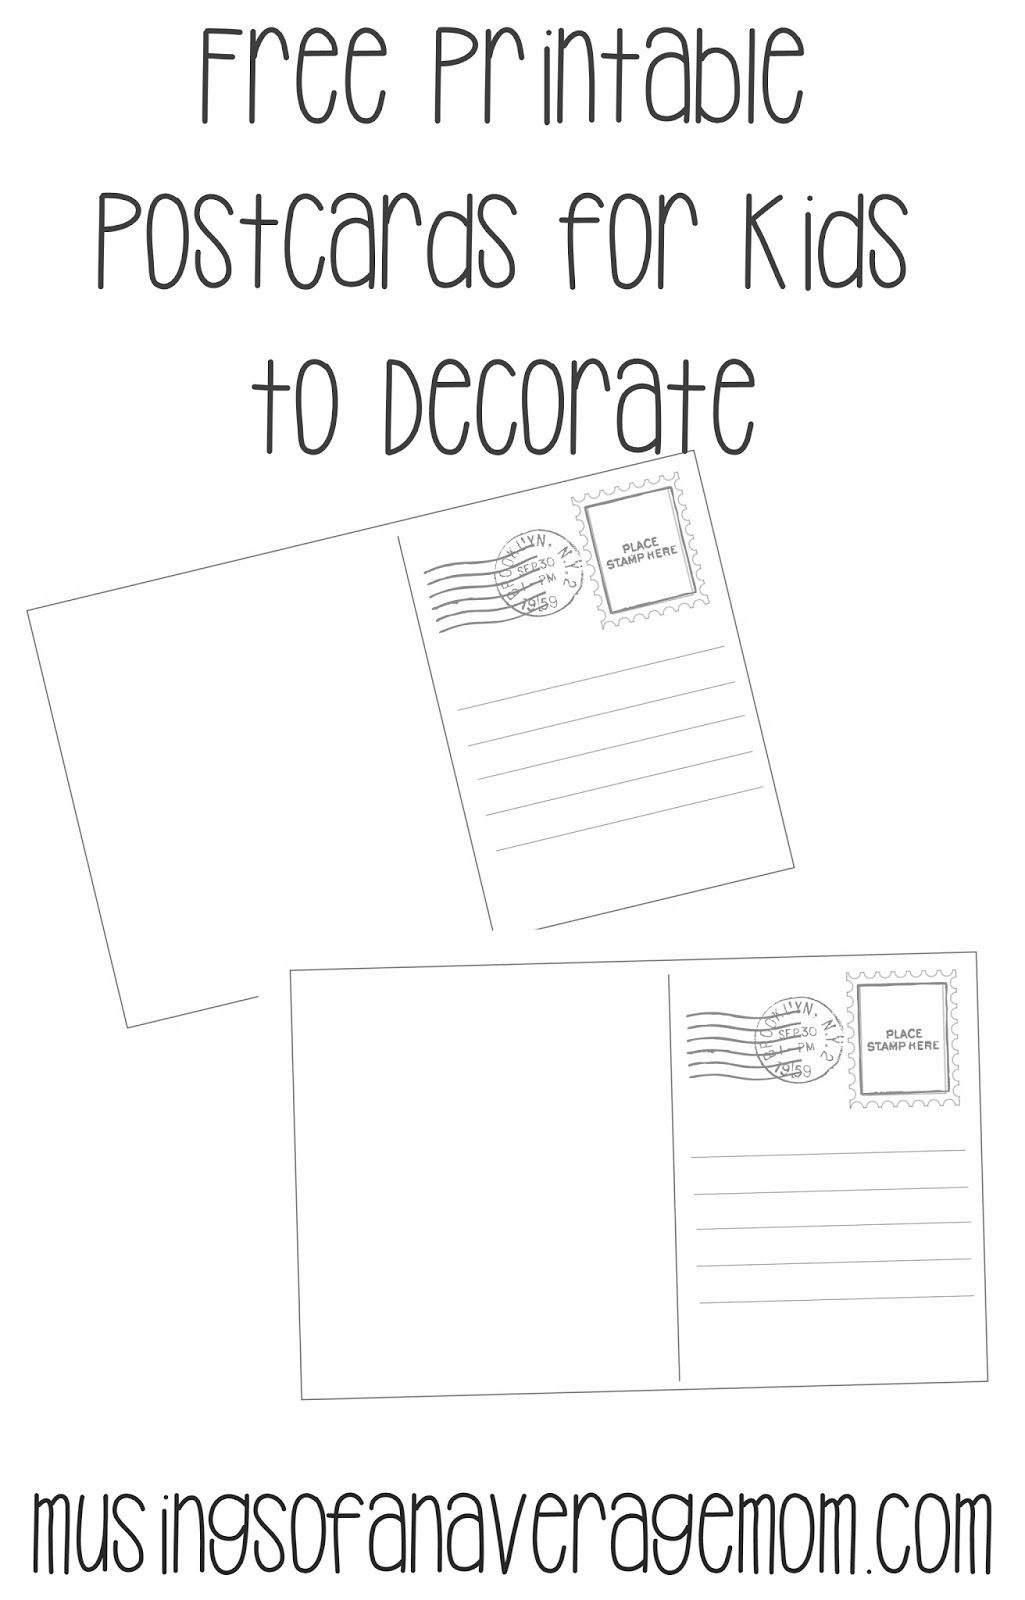 Postcard Templates | Printable Worksheets | Printable Postcards - Free Printable Postcards